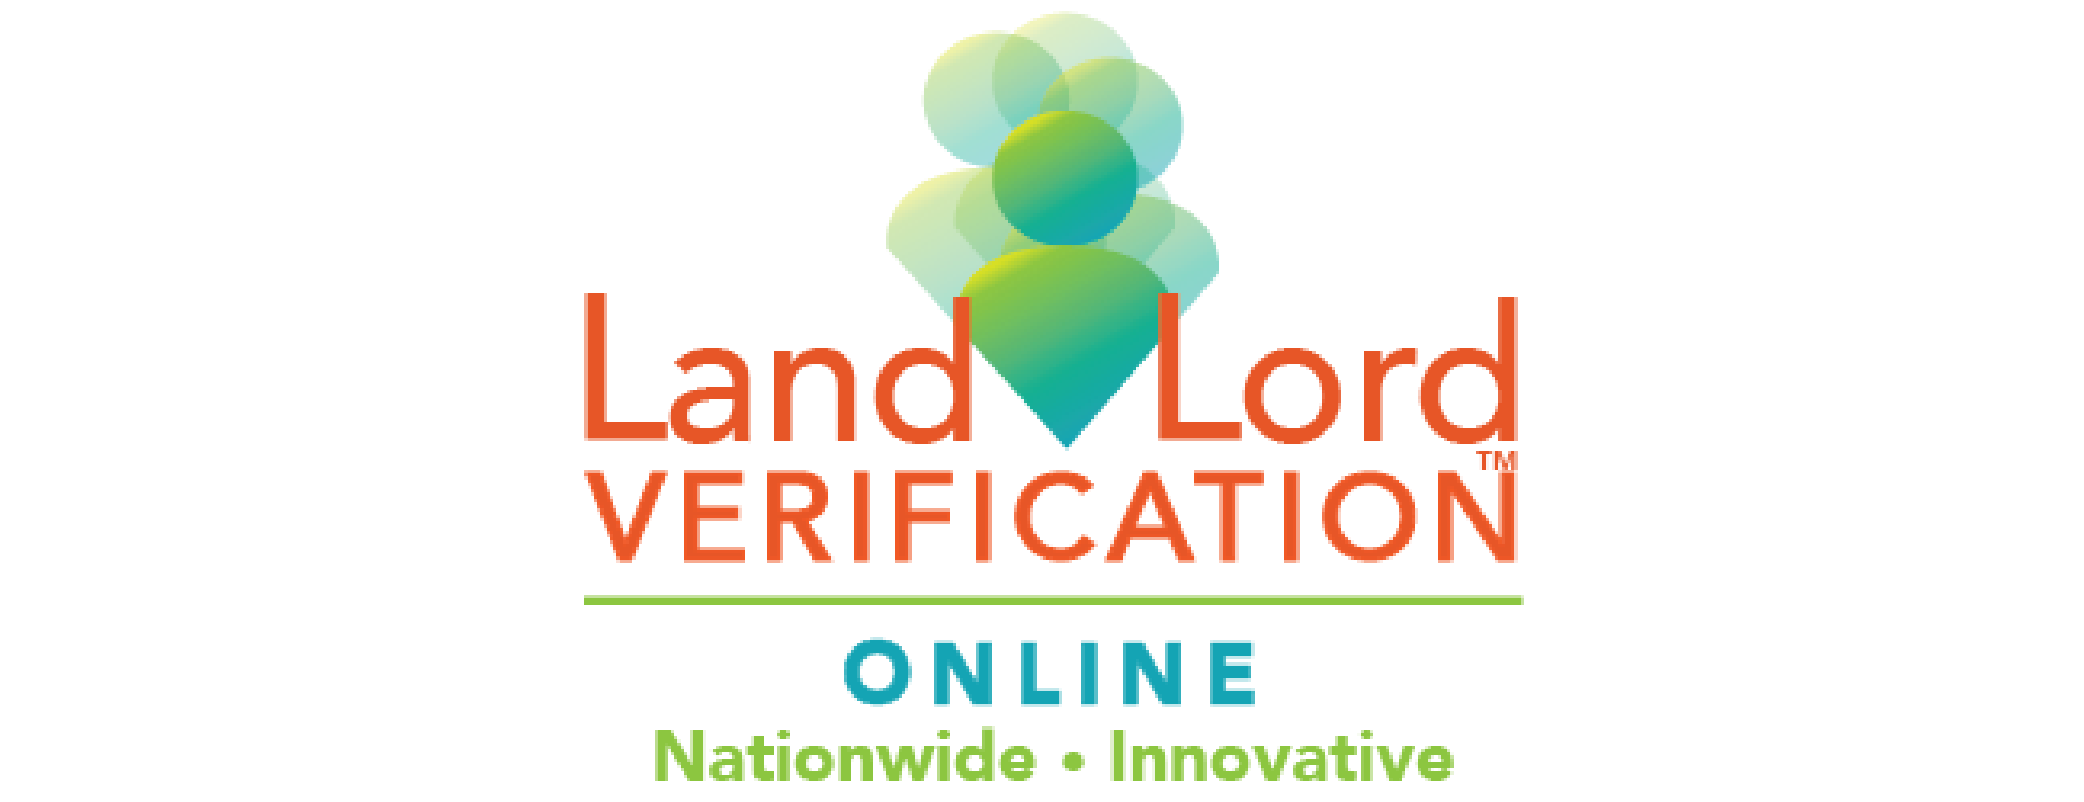 Vendor Logos - Landlord Verification